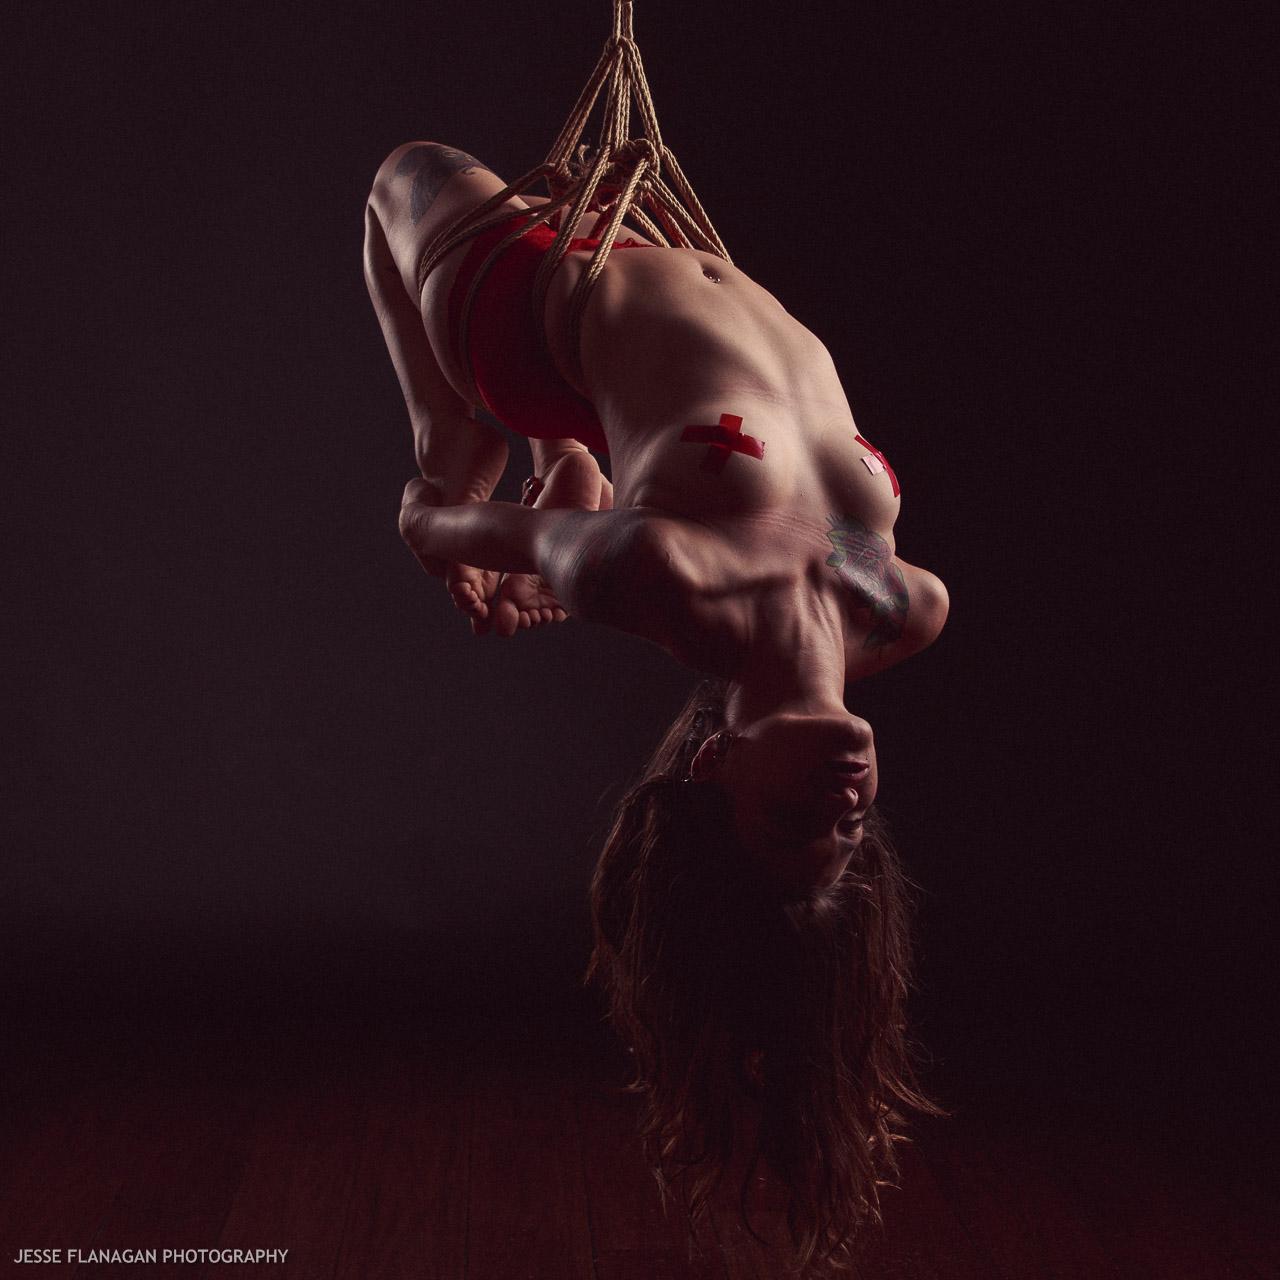 【SMエロ画像】バランス保った上でのプレイw真似しちゃいけない宙吊り緊縛M女www 23